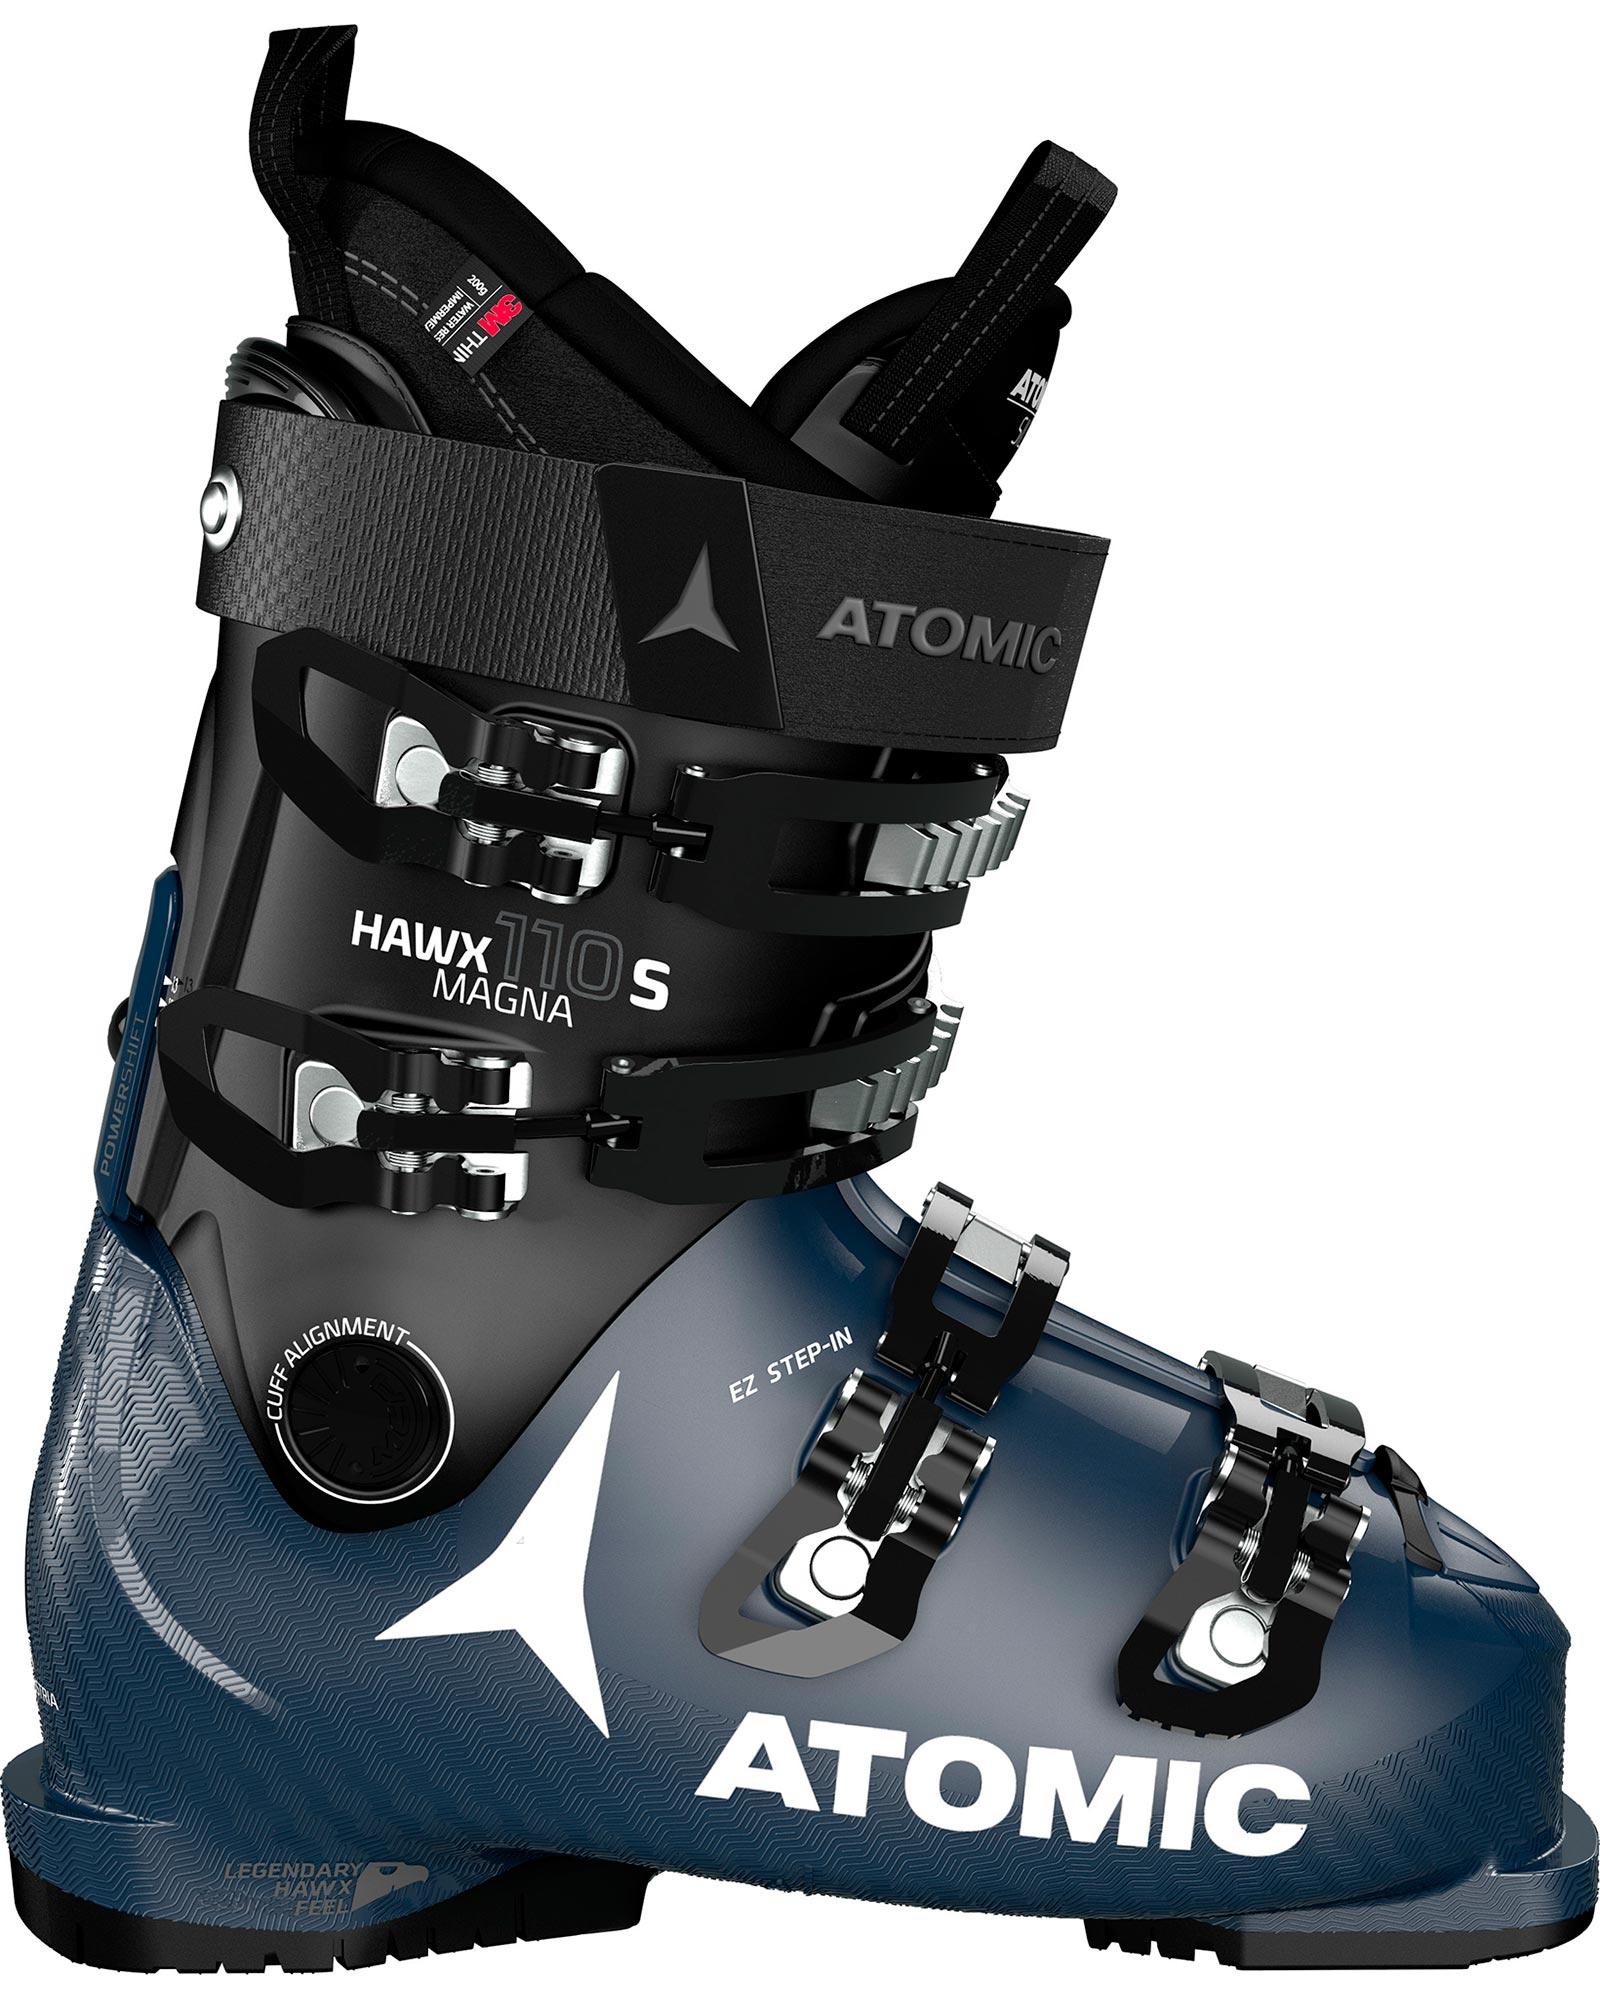 Atomic Men's Hawx Magna 110 S Ski Boots 2020 / 2021 0